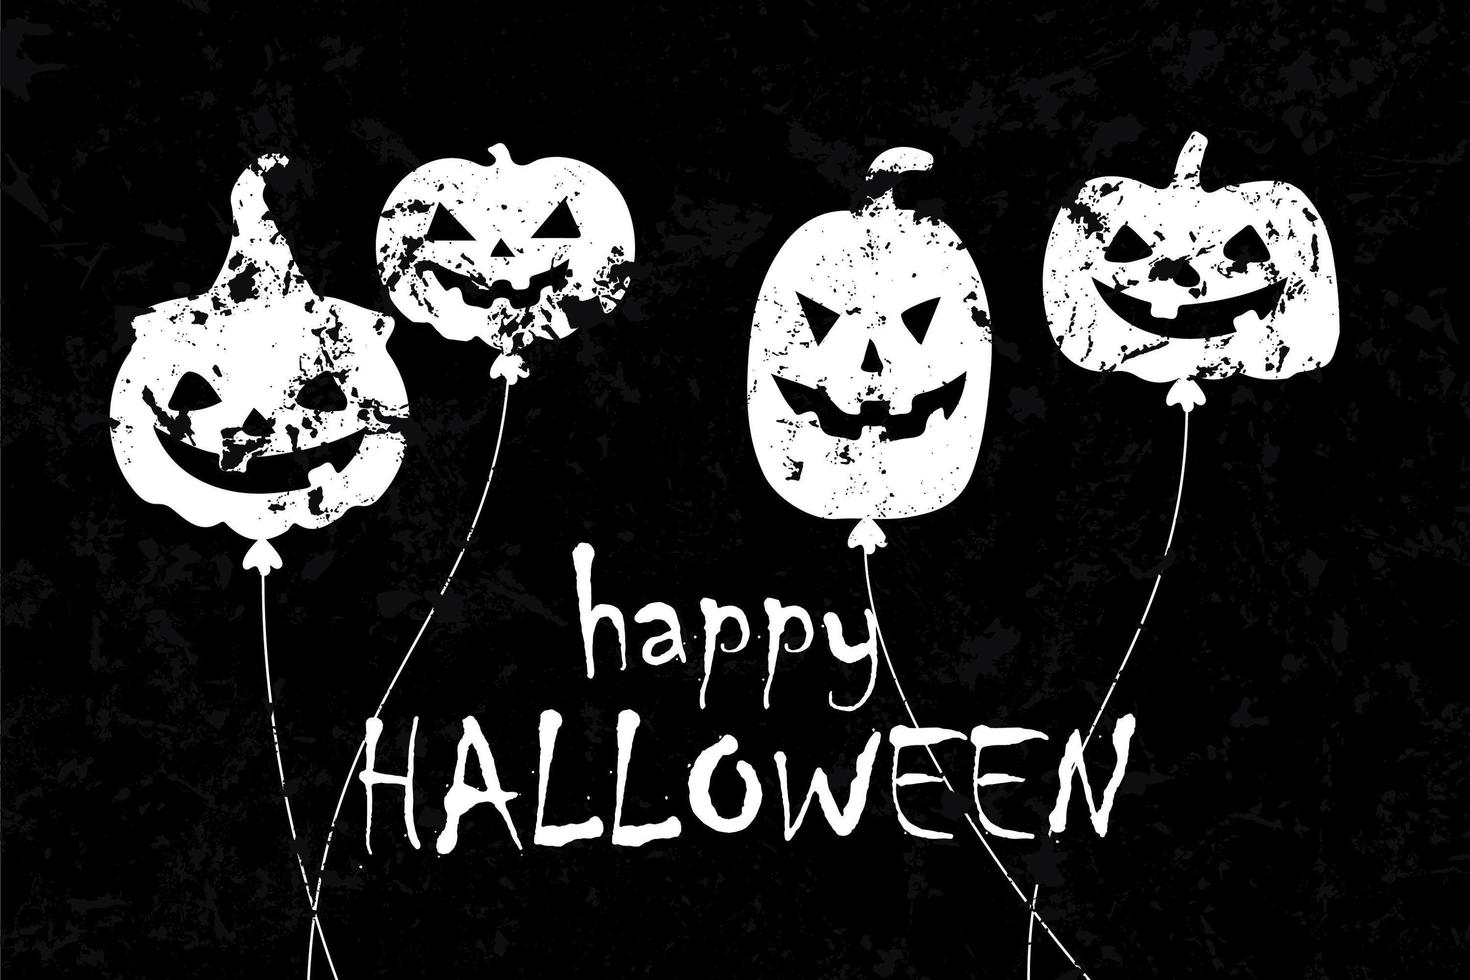 halloween ballong med läskiga ansikten grunge design vektor